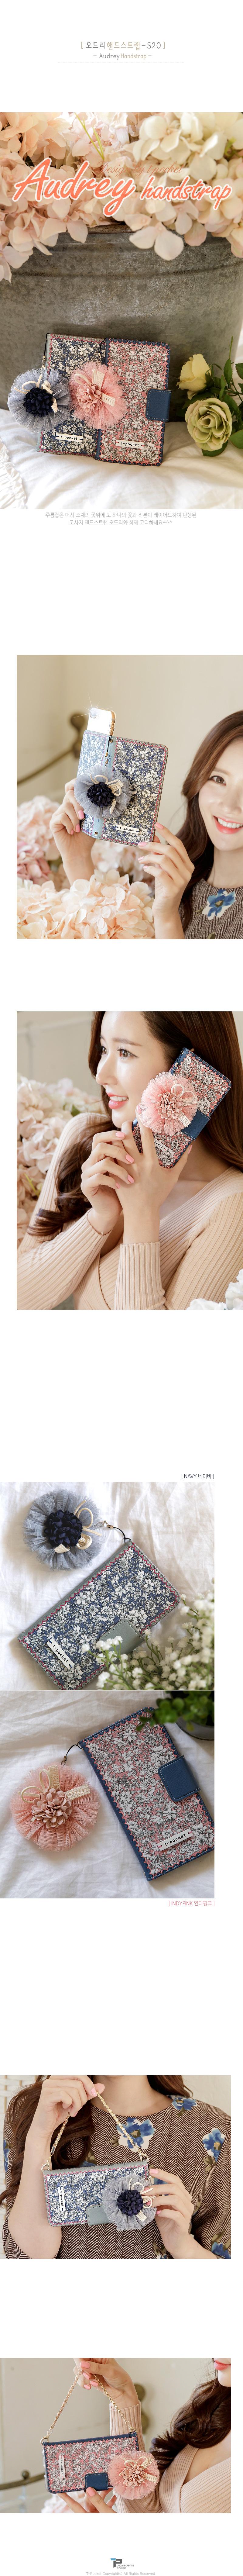 (Audrey 오드리) Handstrap 핸드스트랩 - 통큰주머니, 13,900원, 스트랩, 주문제작 스트랩